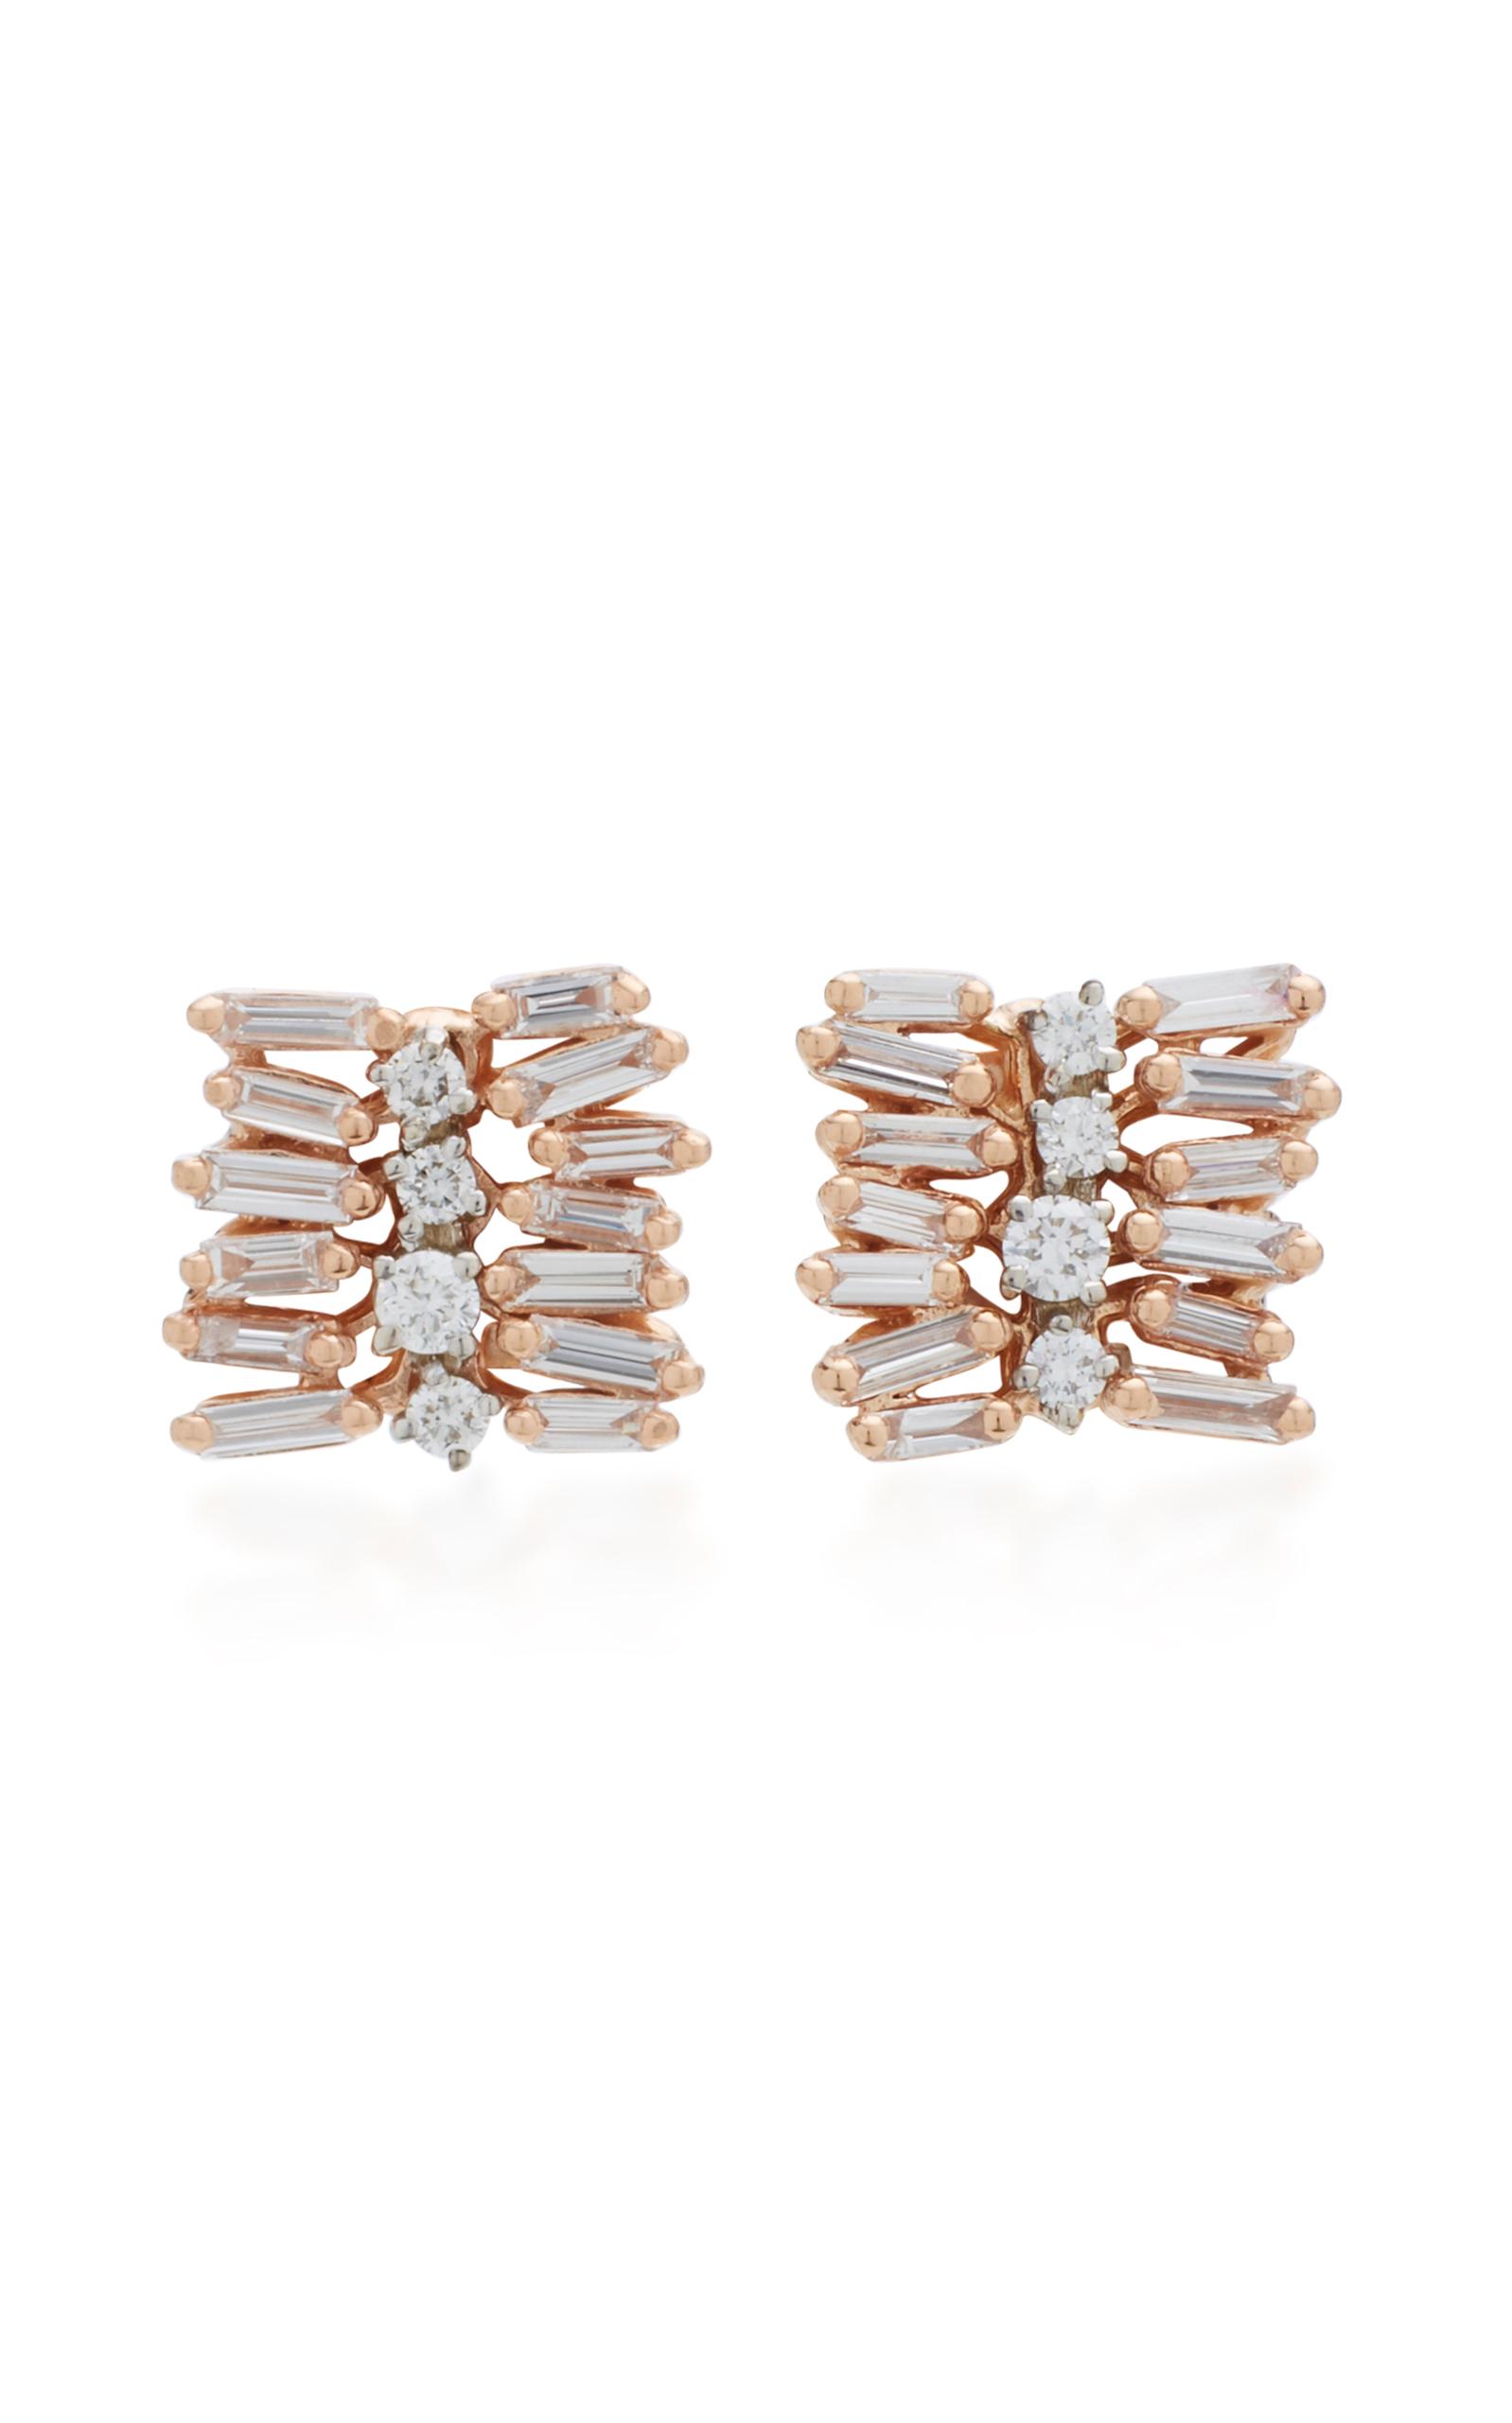 Moda Operandi | Small Post 18K Rose Gold Diamond Earrings by Suzanne